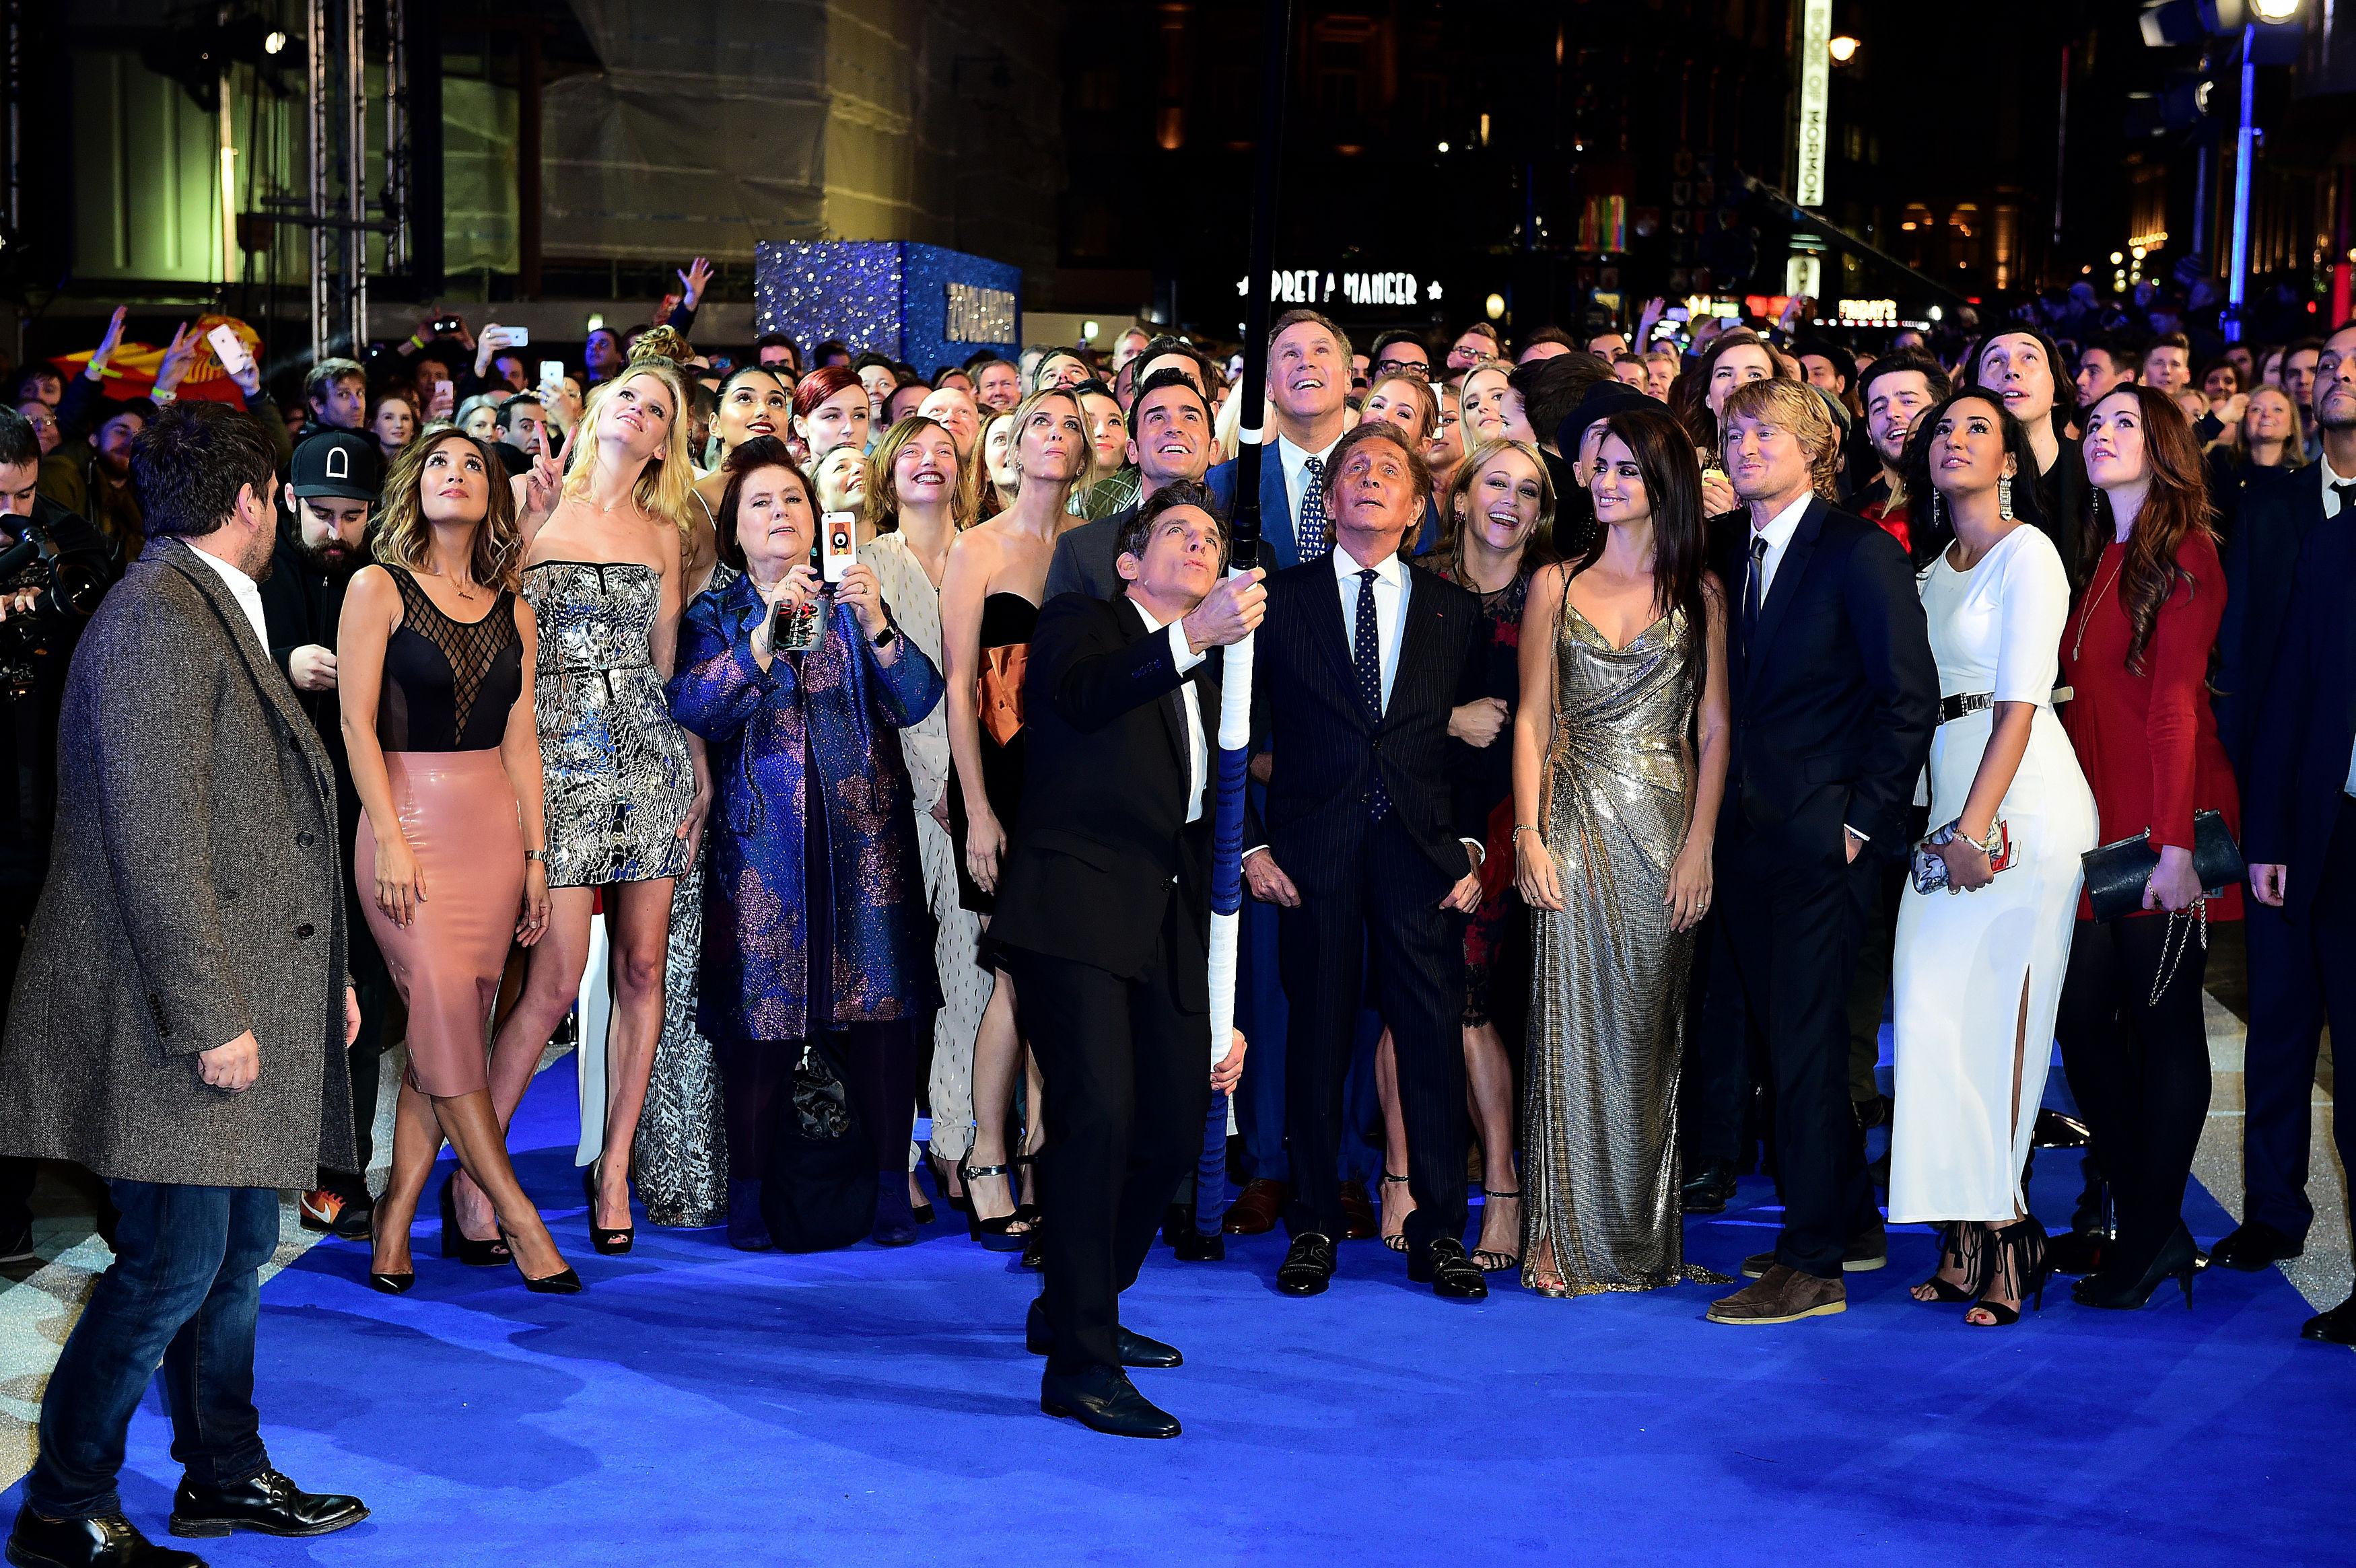 Ben Stiller broke the record for the world's longest selfie stick at the Zoolander 2 UK premiere